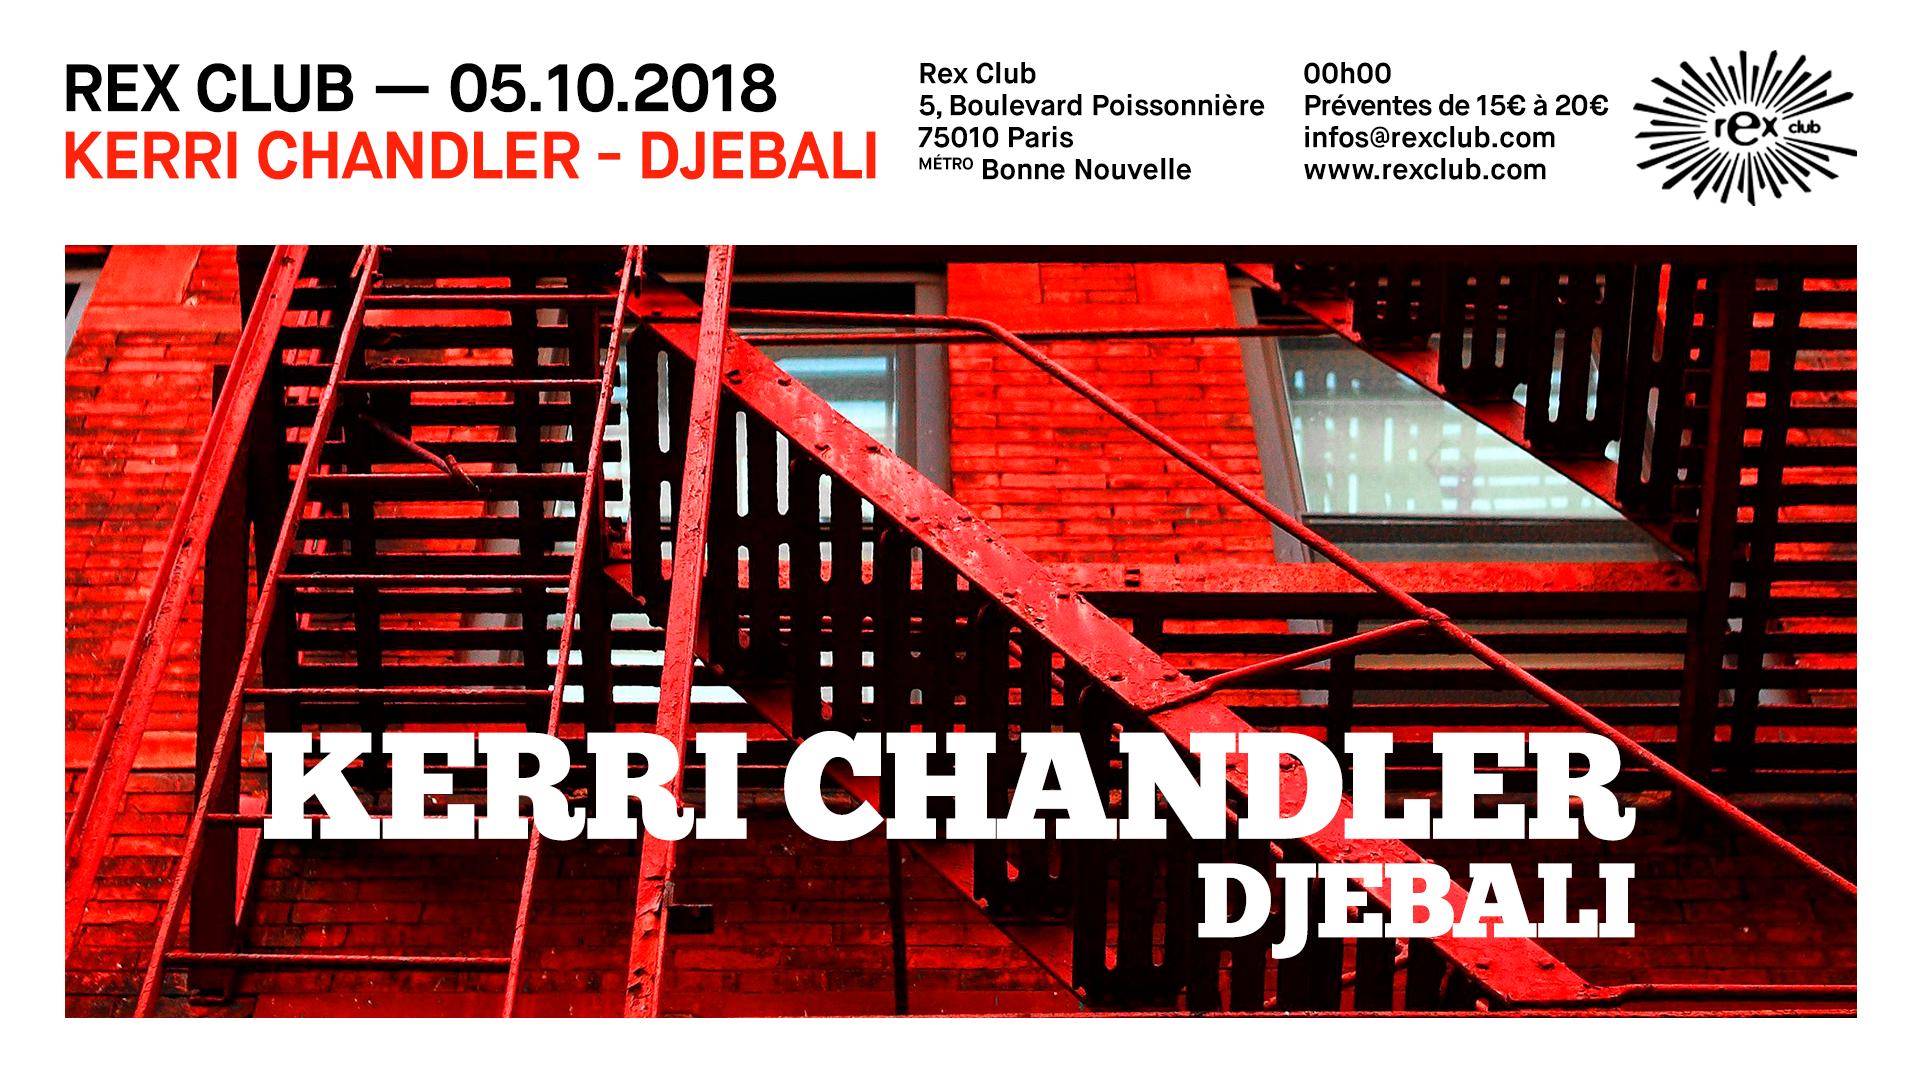 20181005_un_rêve_kerri_chandler_facebook_event_banner_1920x1080